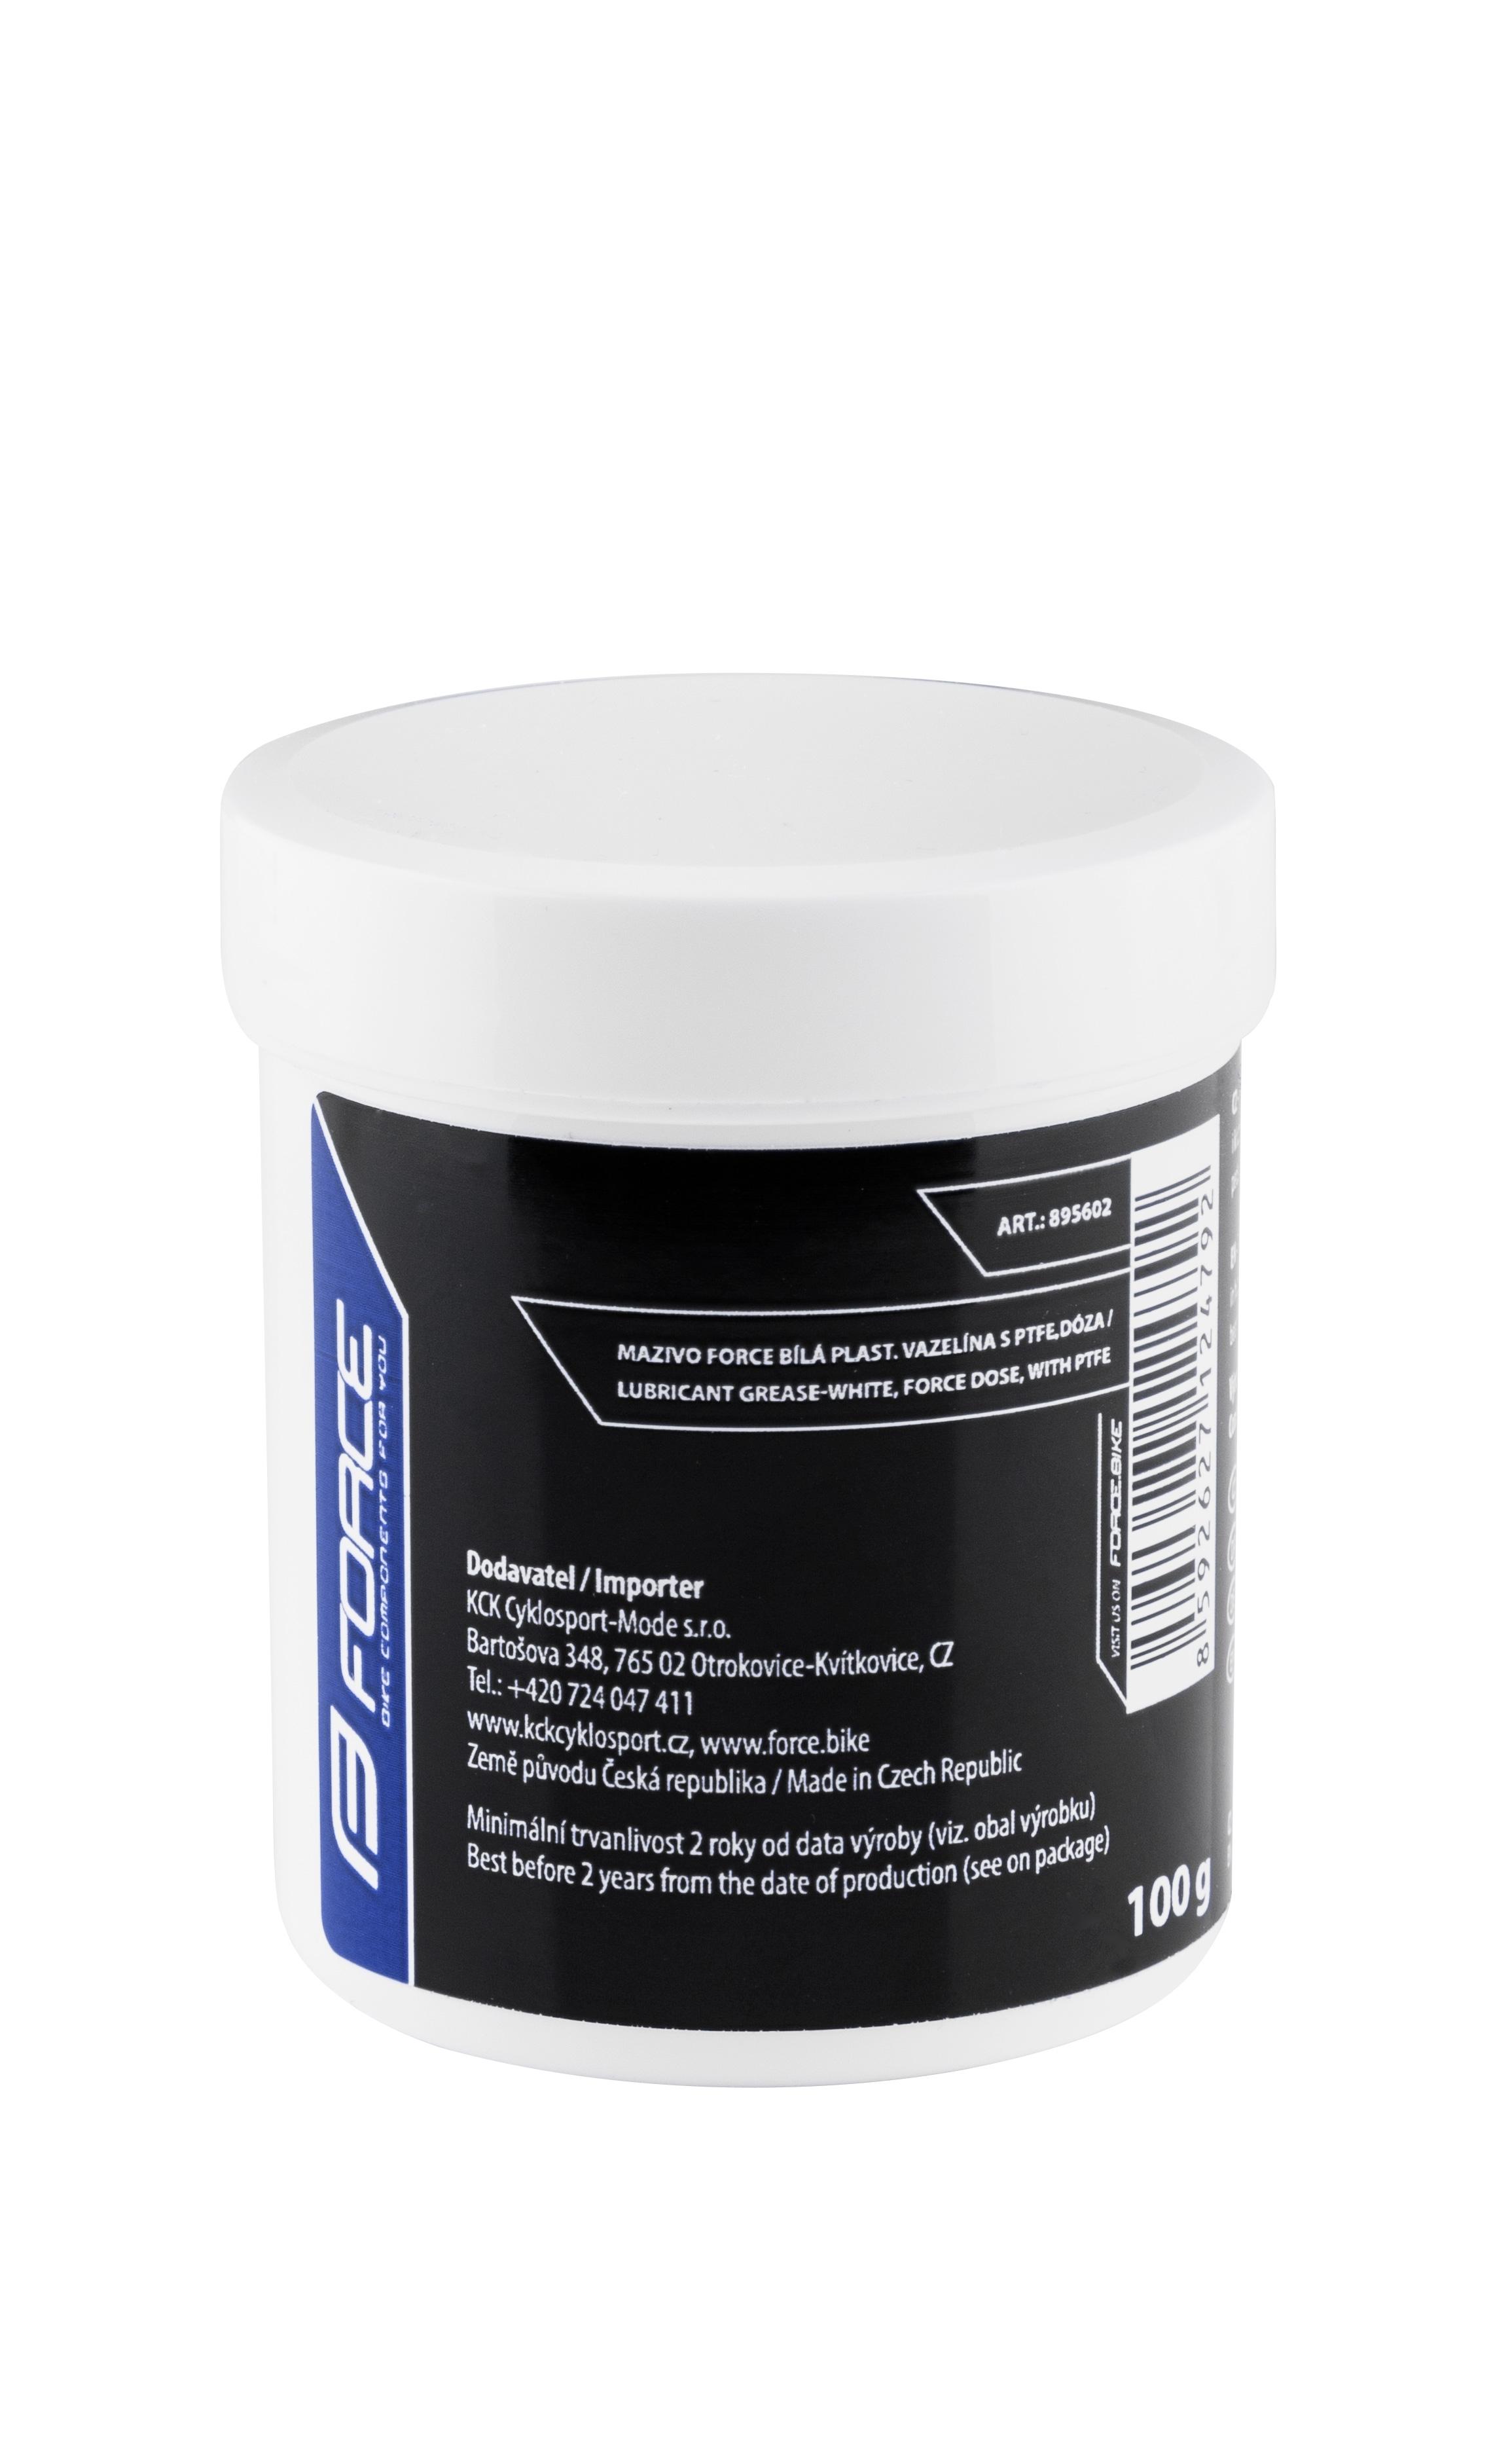 mazivo FORCE bílá plast. vazelína s PTFE,dóza 100g